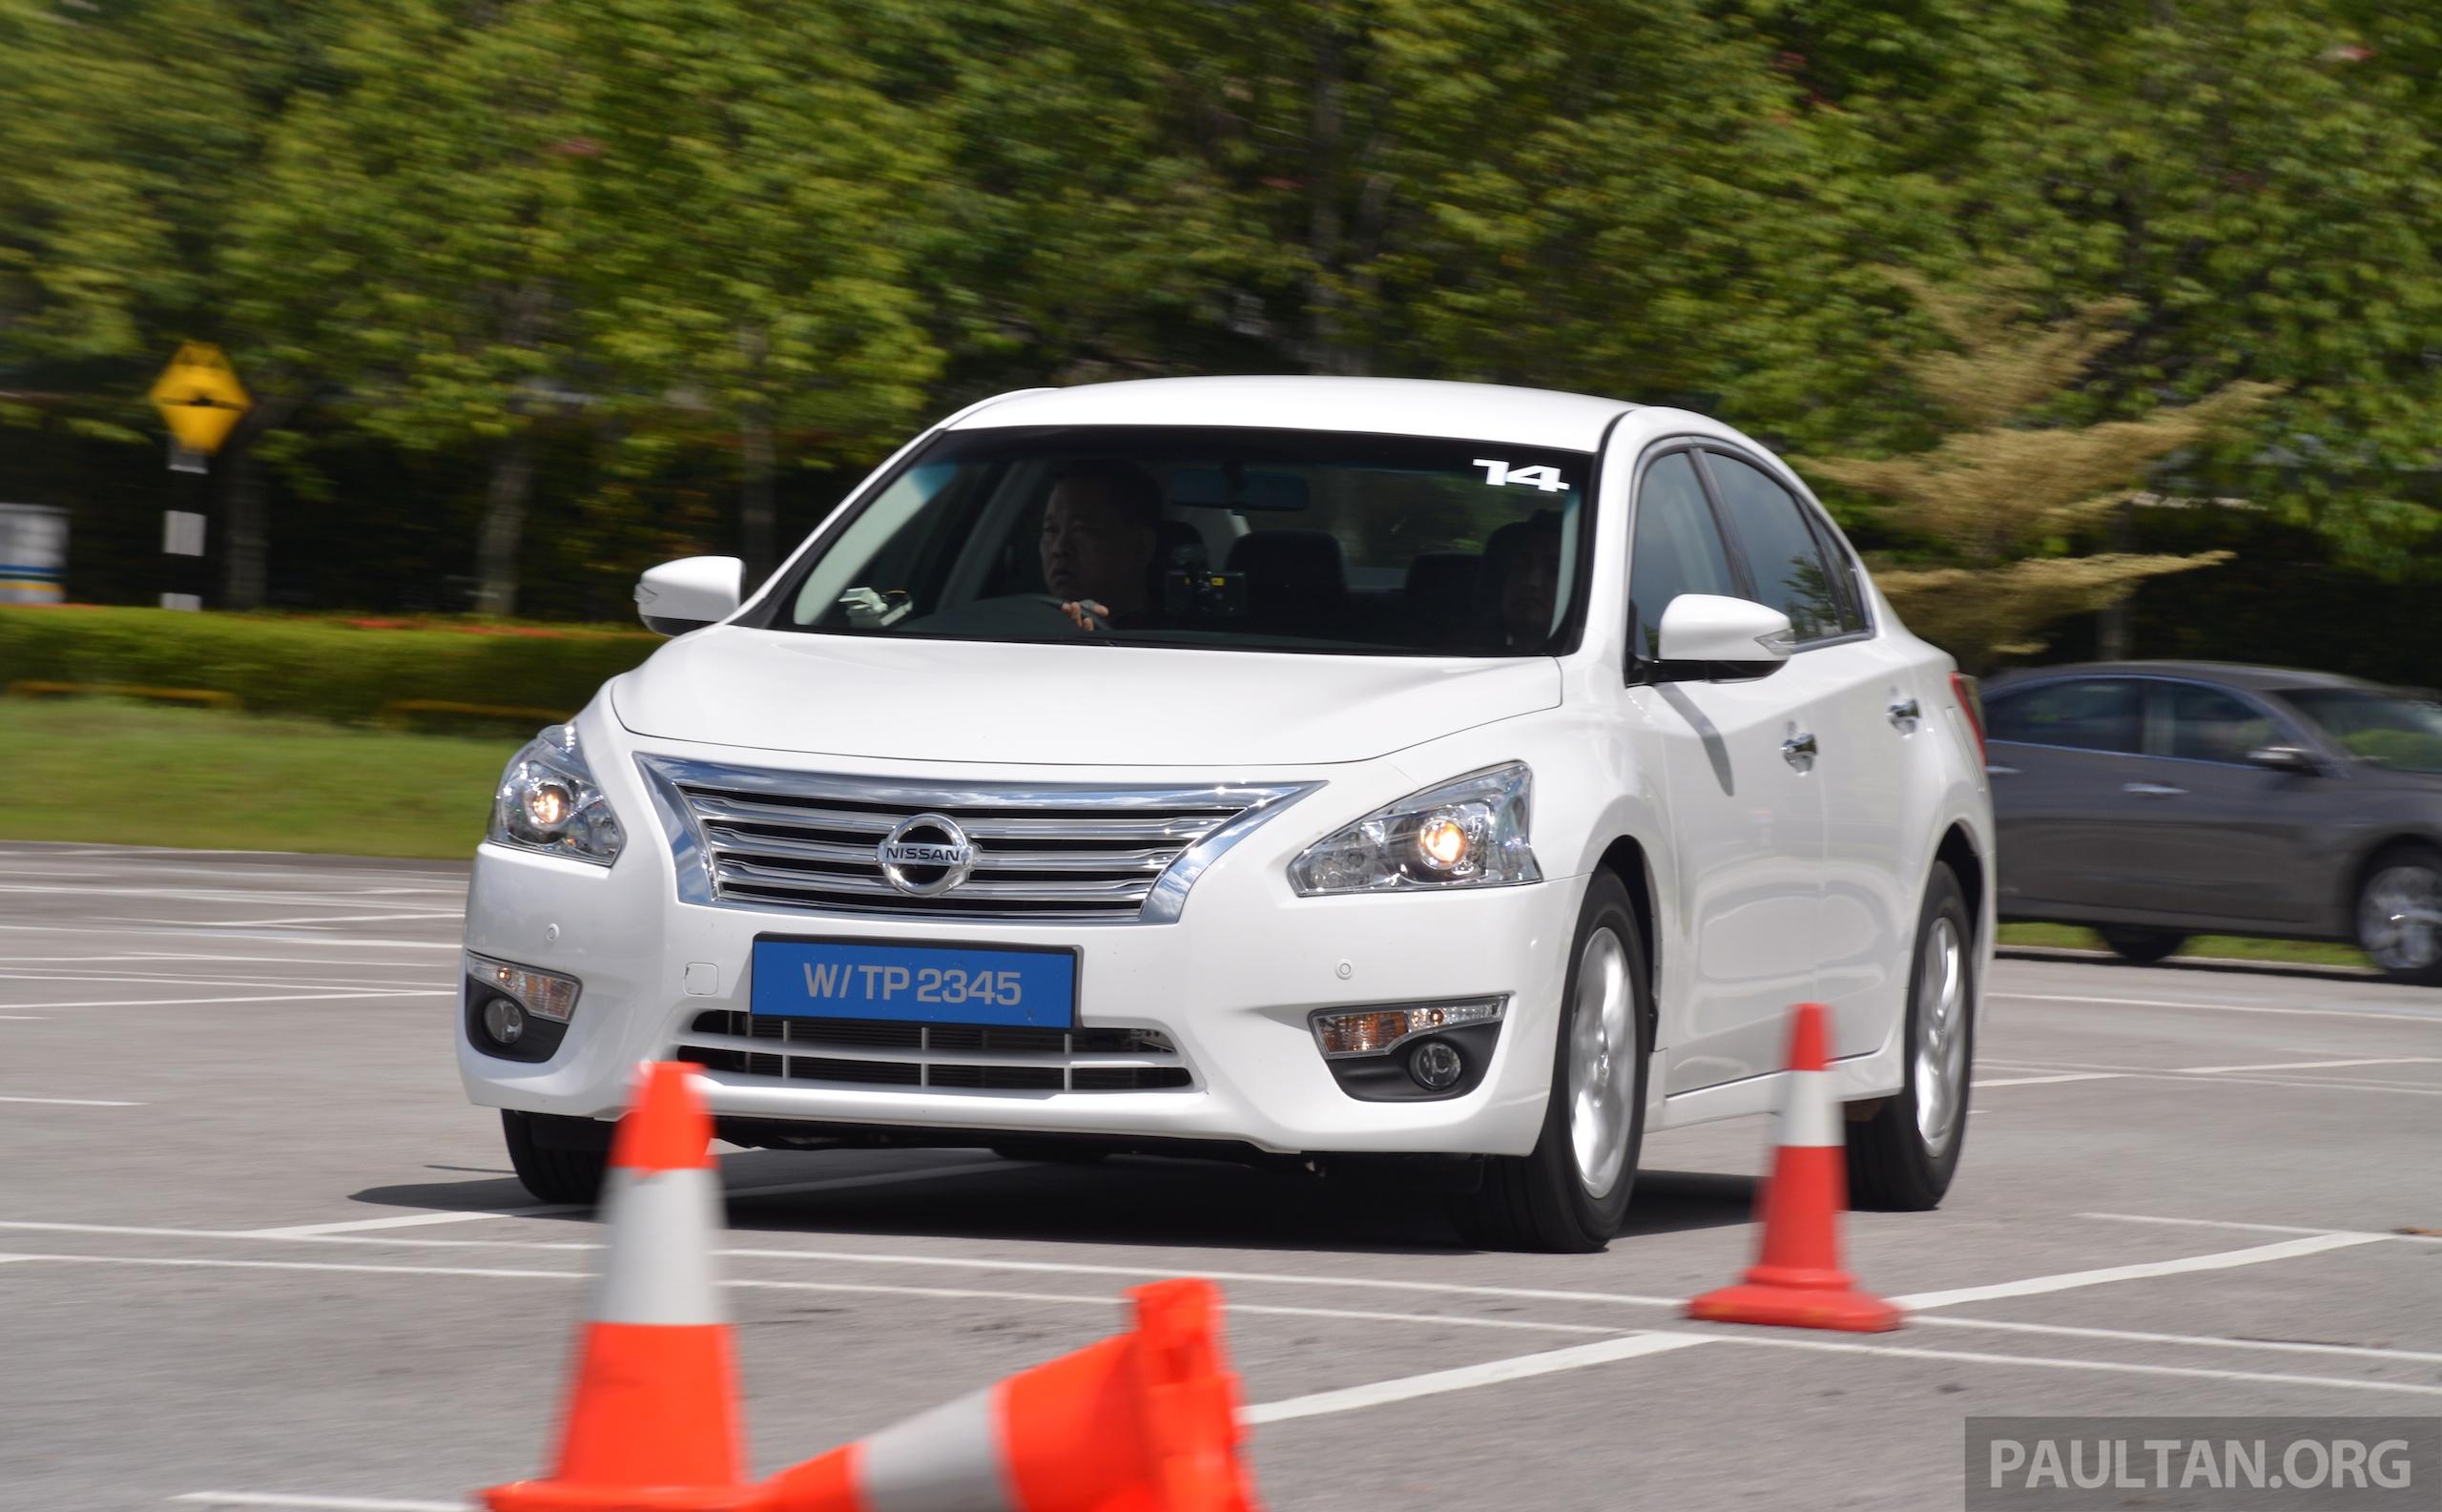 Driven 2014 Nissan Teana Ups The D Segment Ante Image 247940